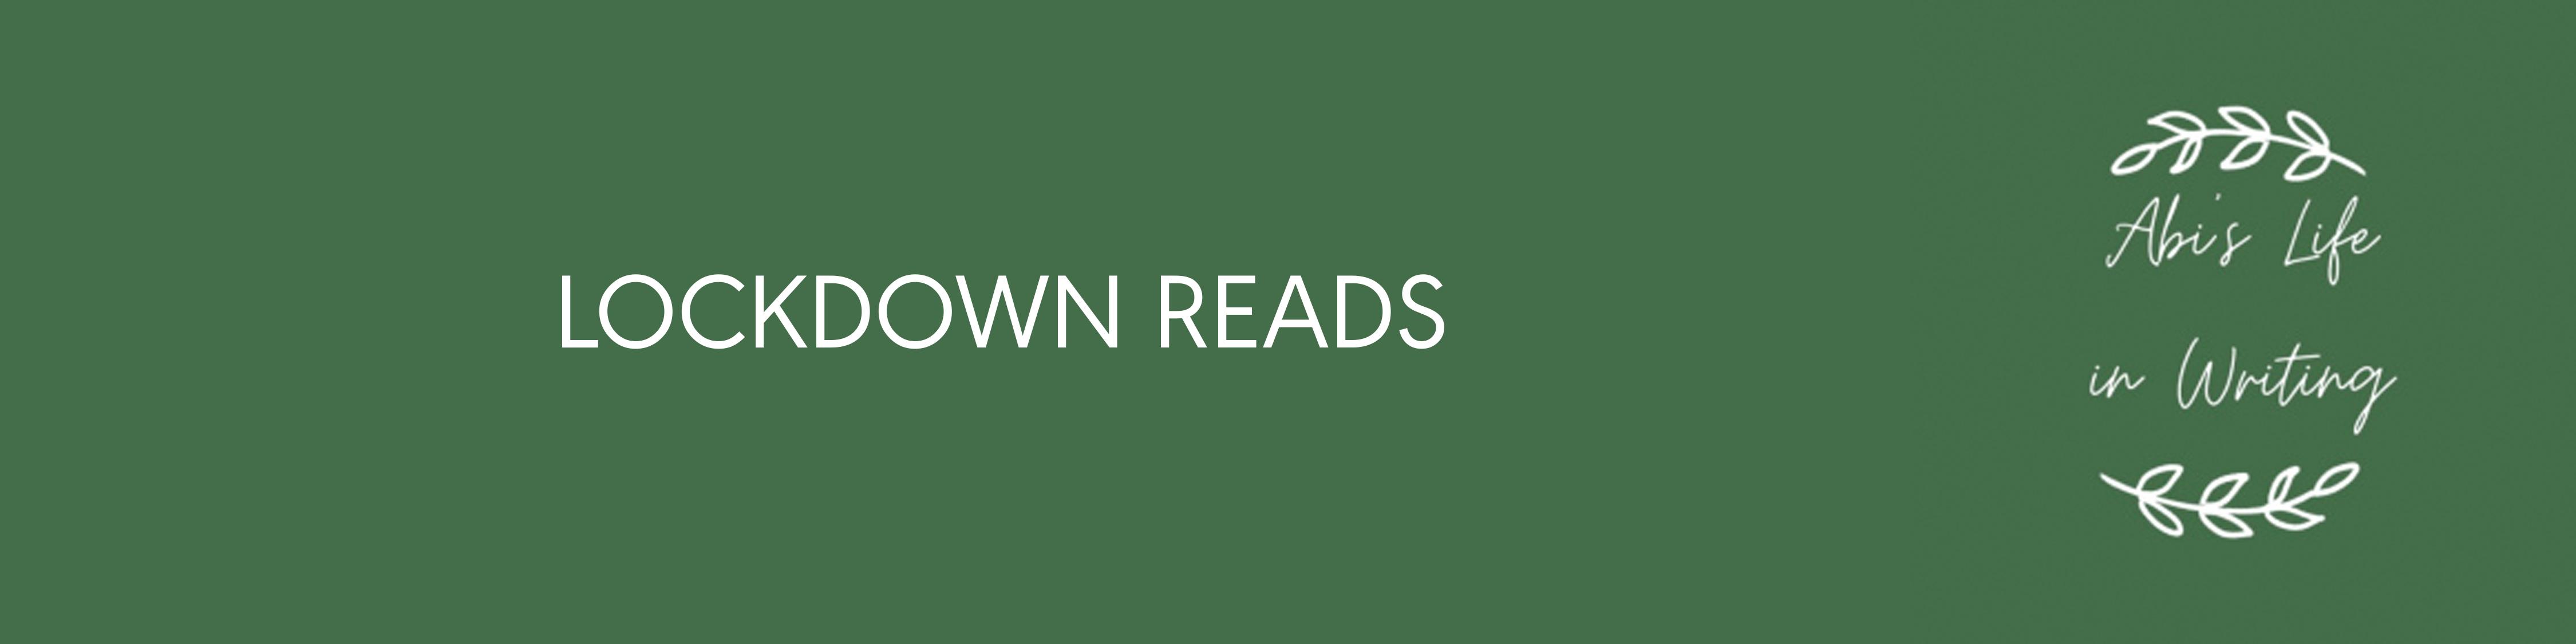 Lockdown Reads